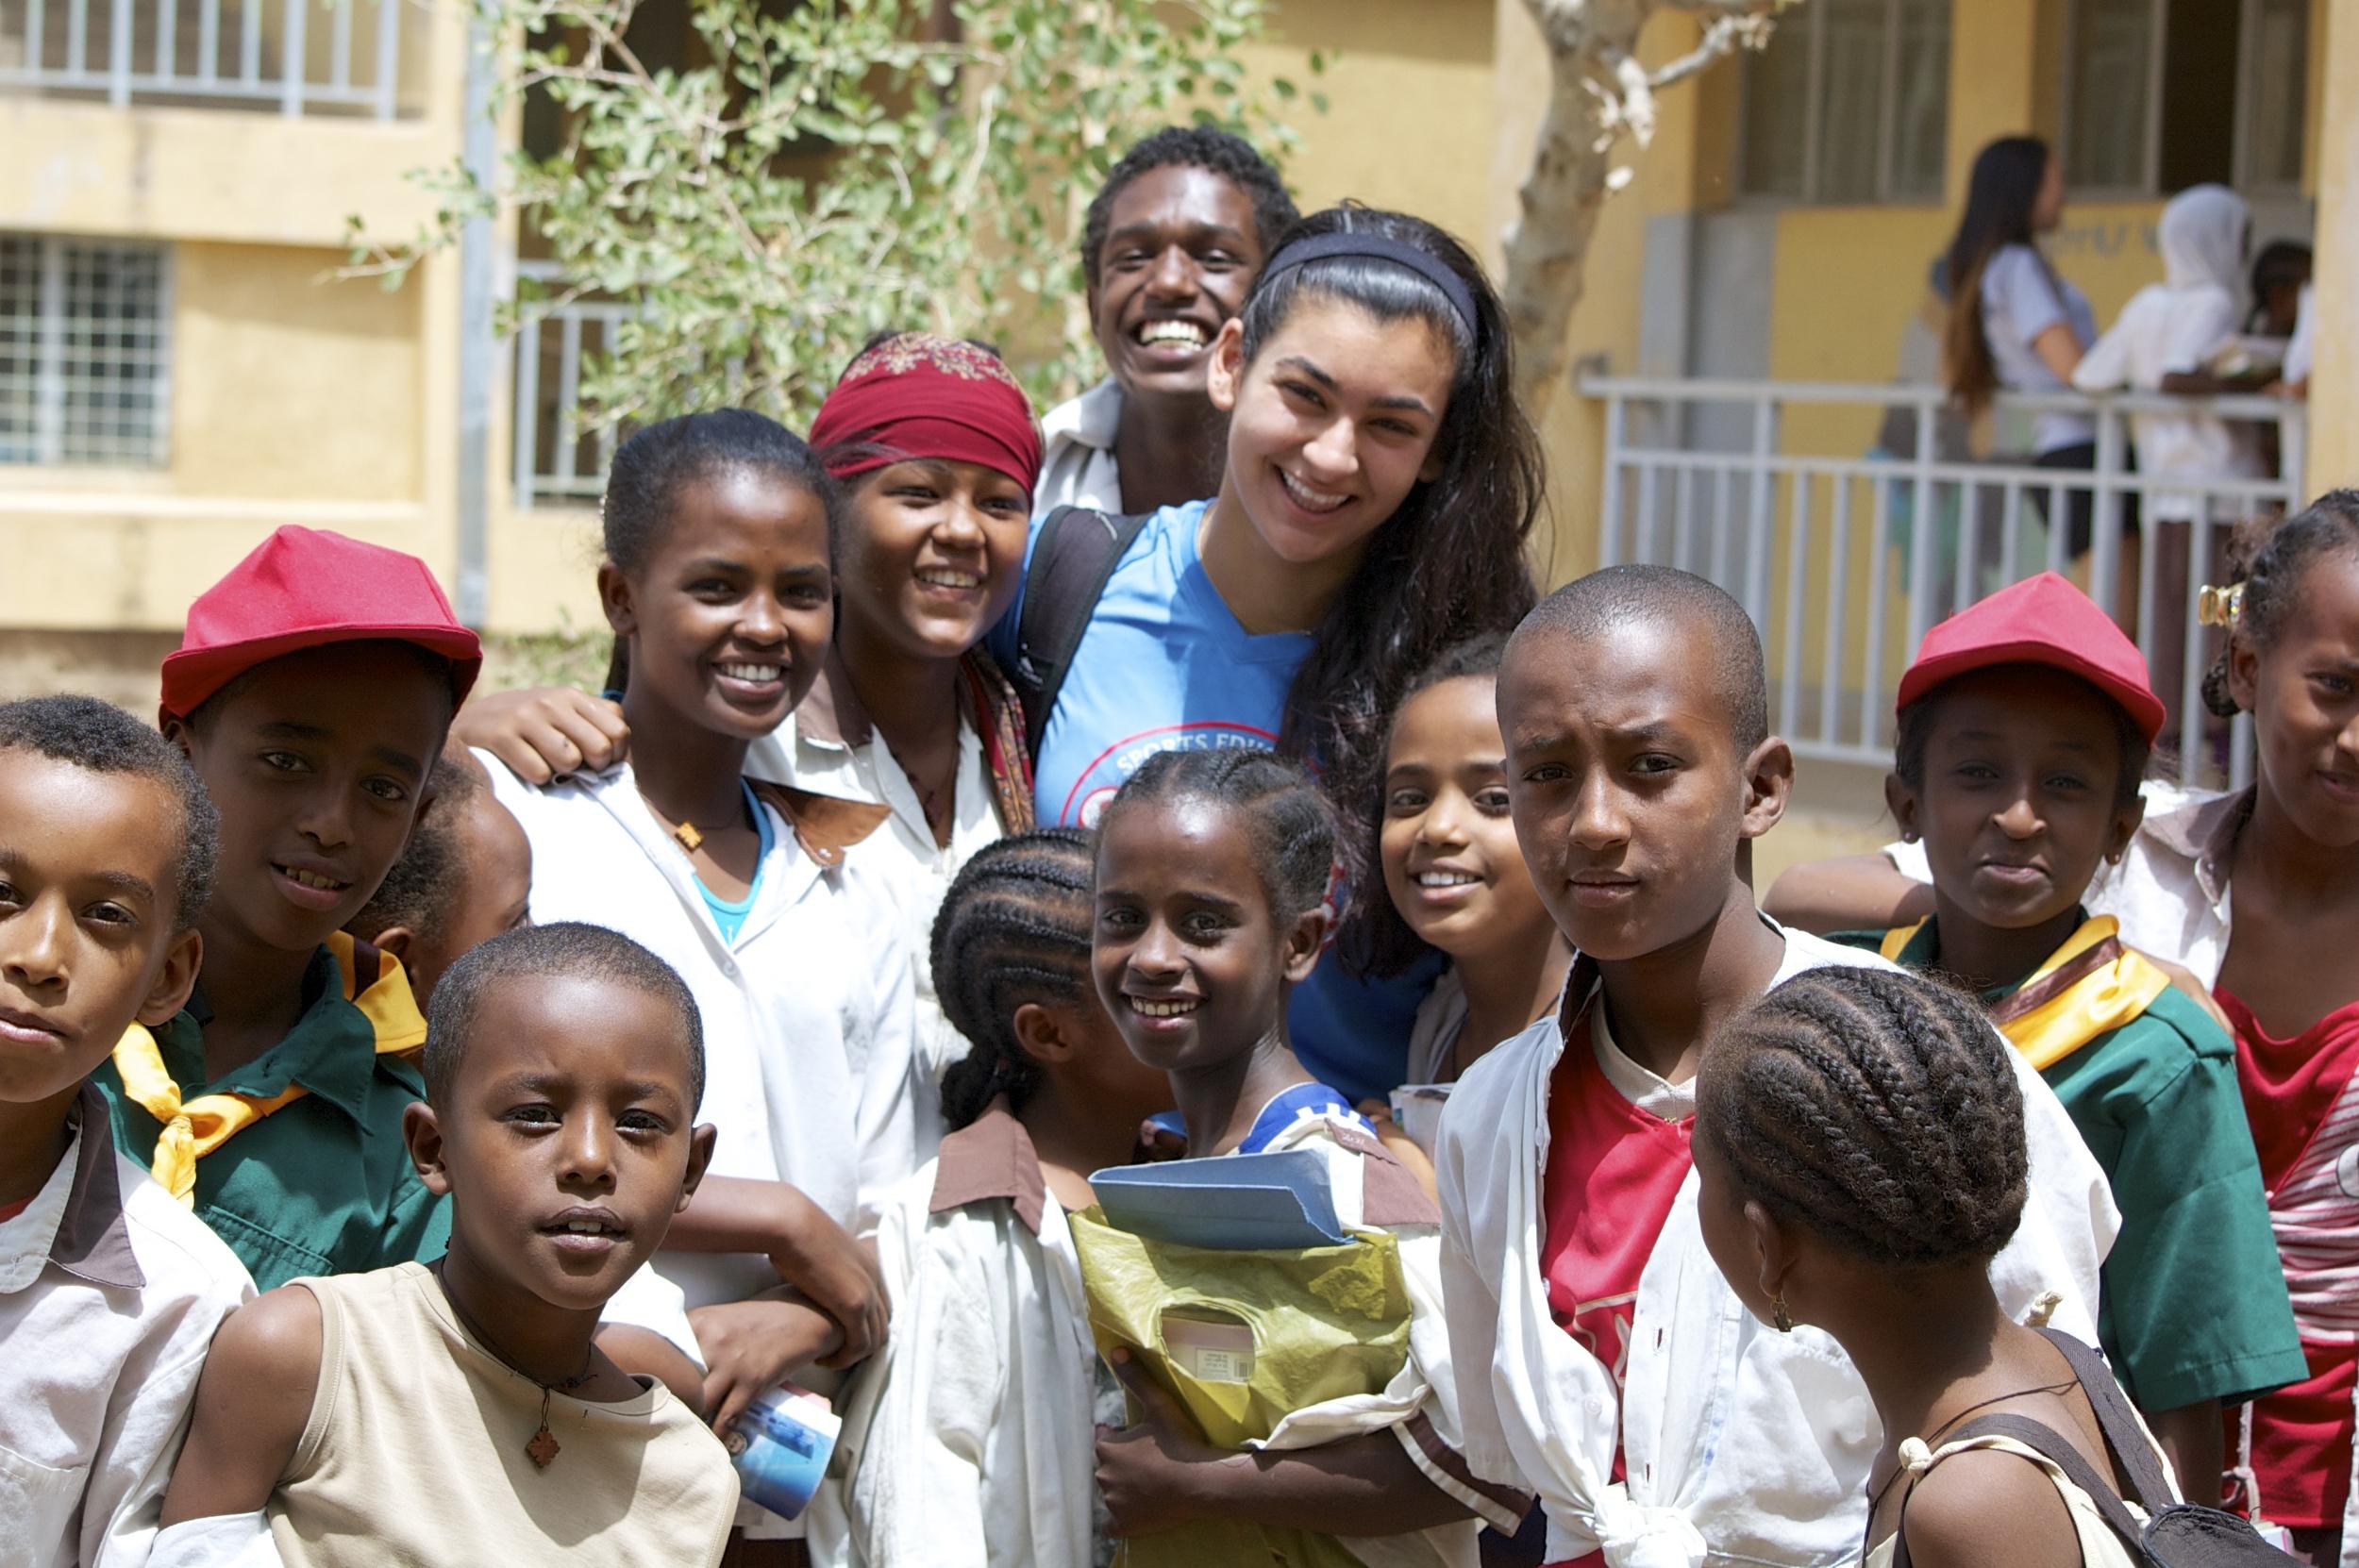 Group photo with Hanna